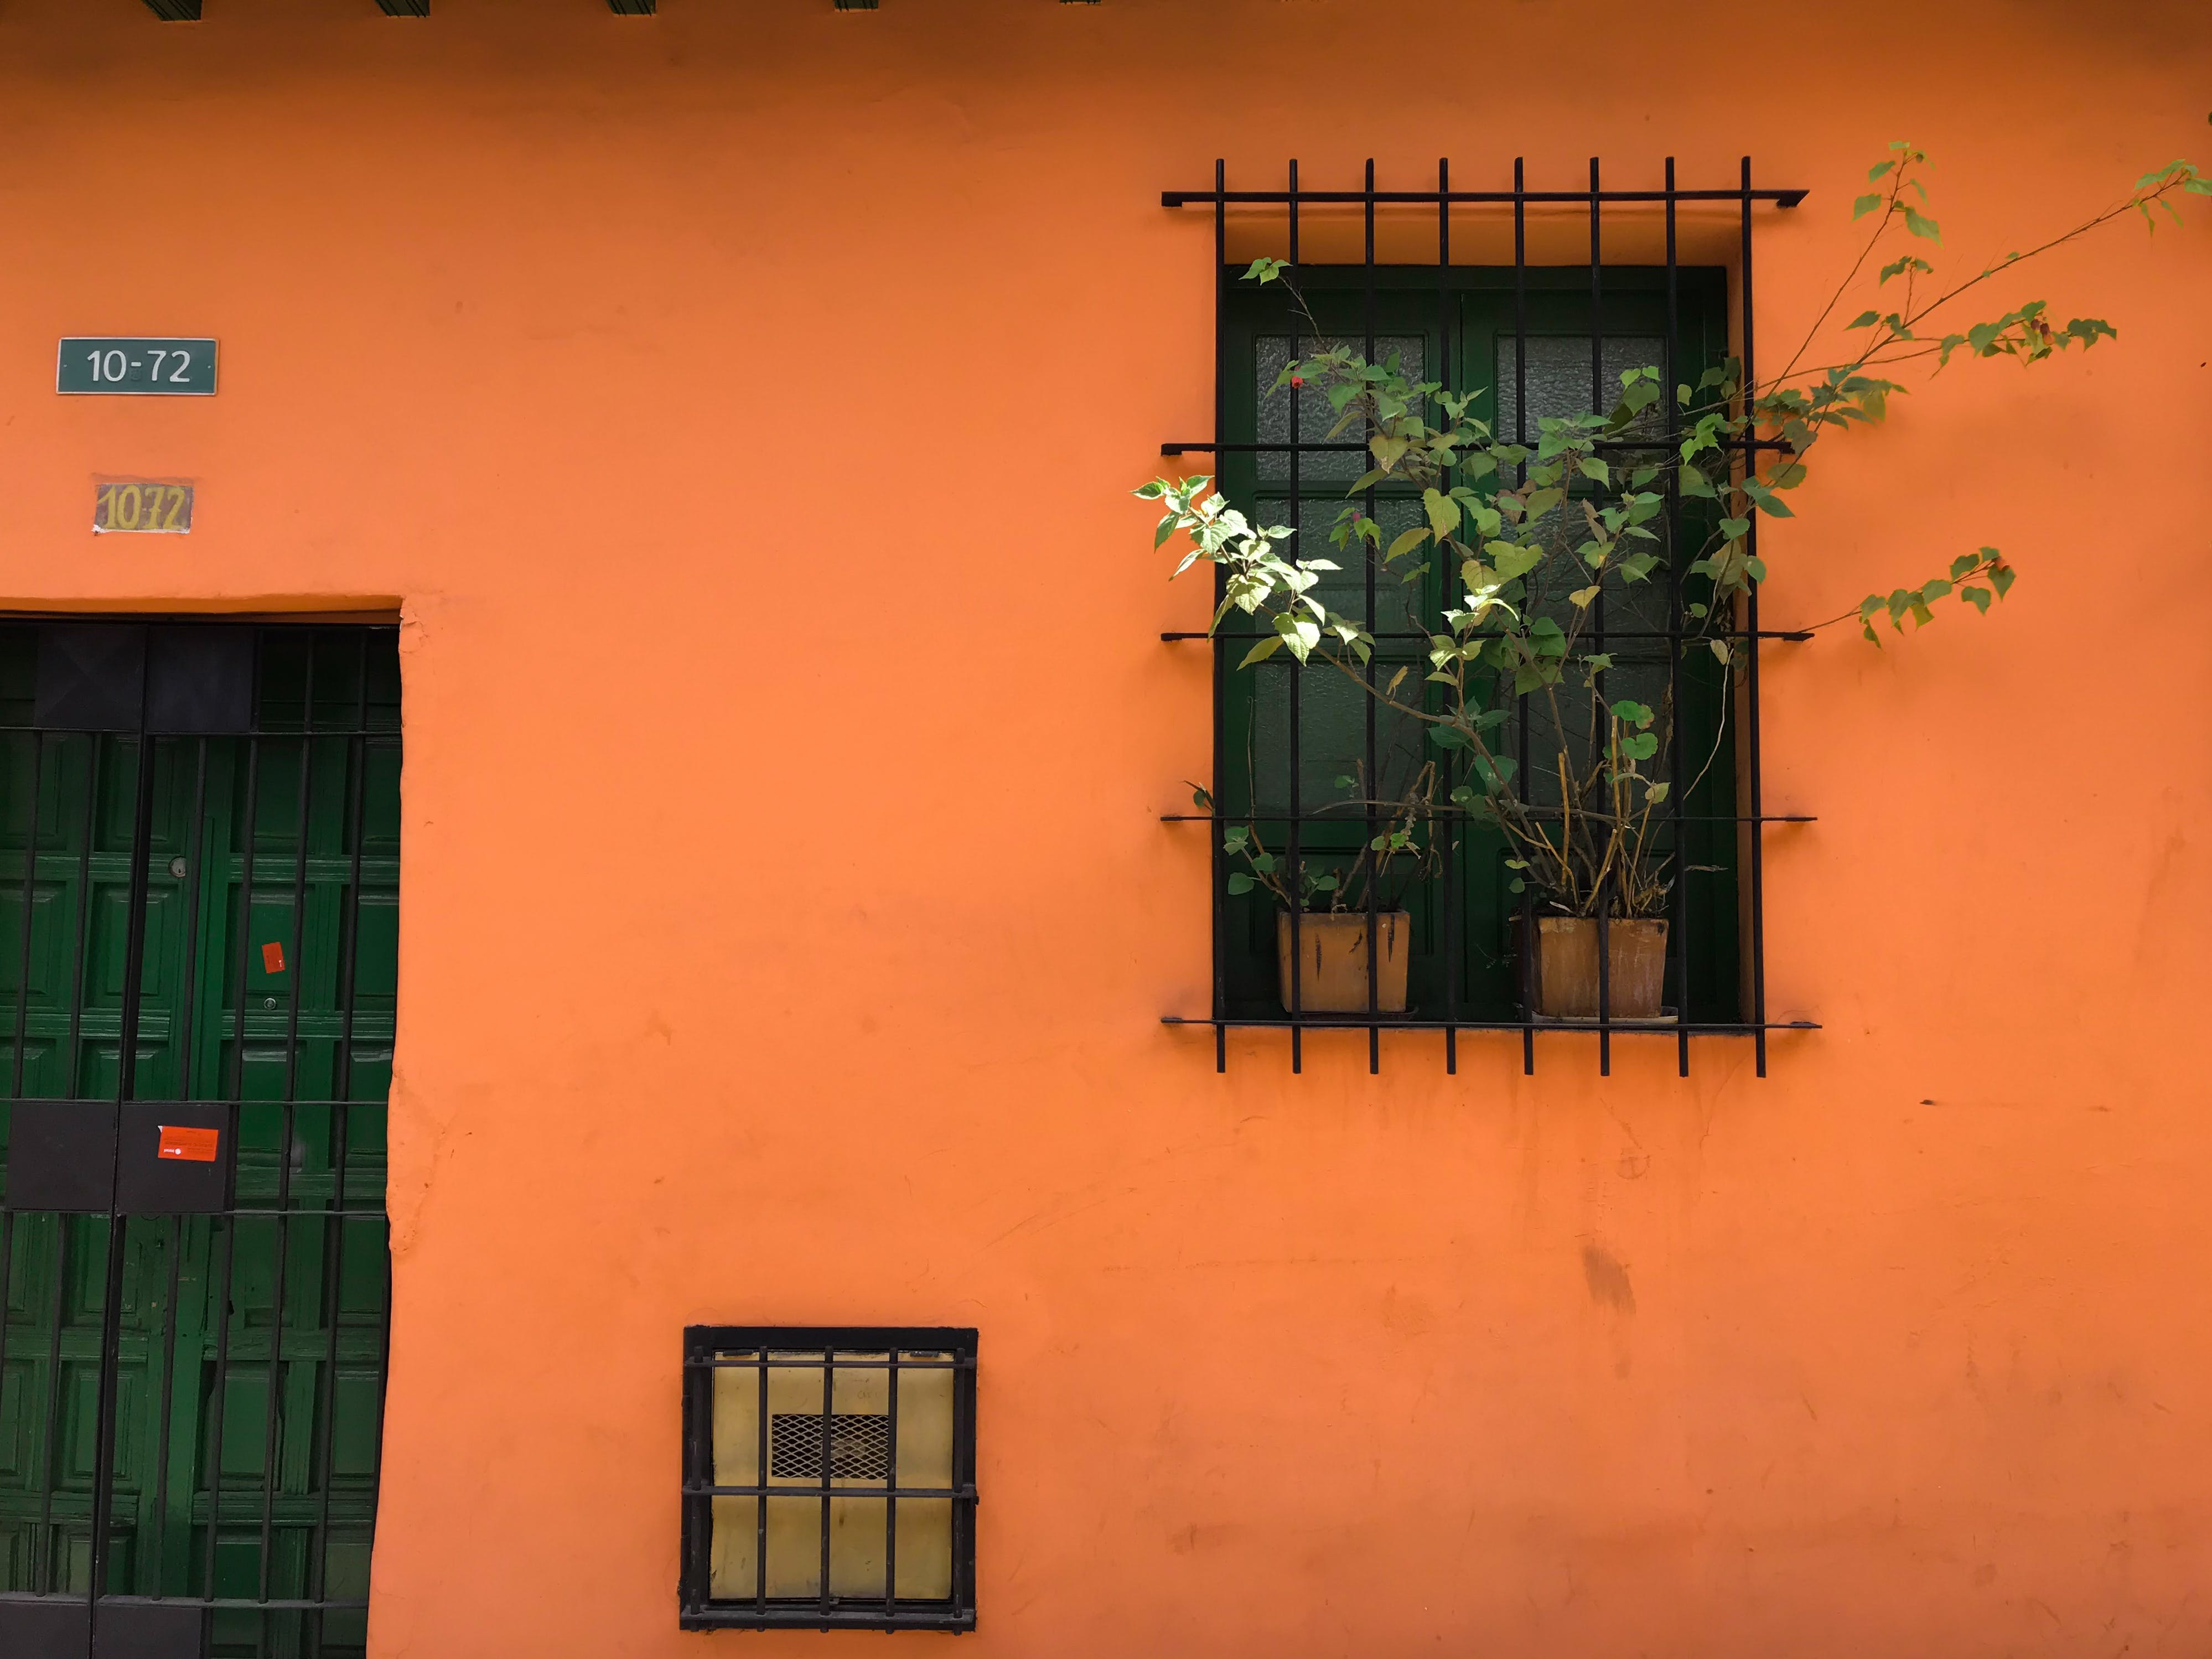 Black Steel Window Bars With Green Plants